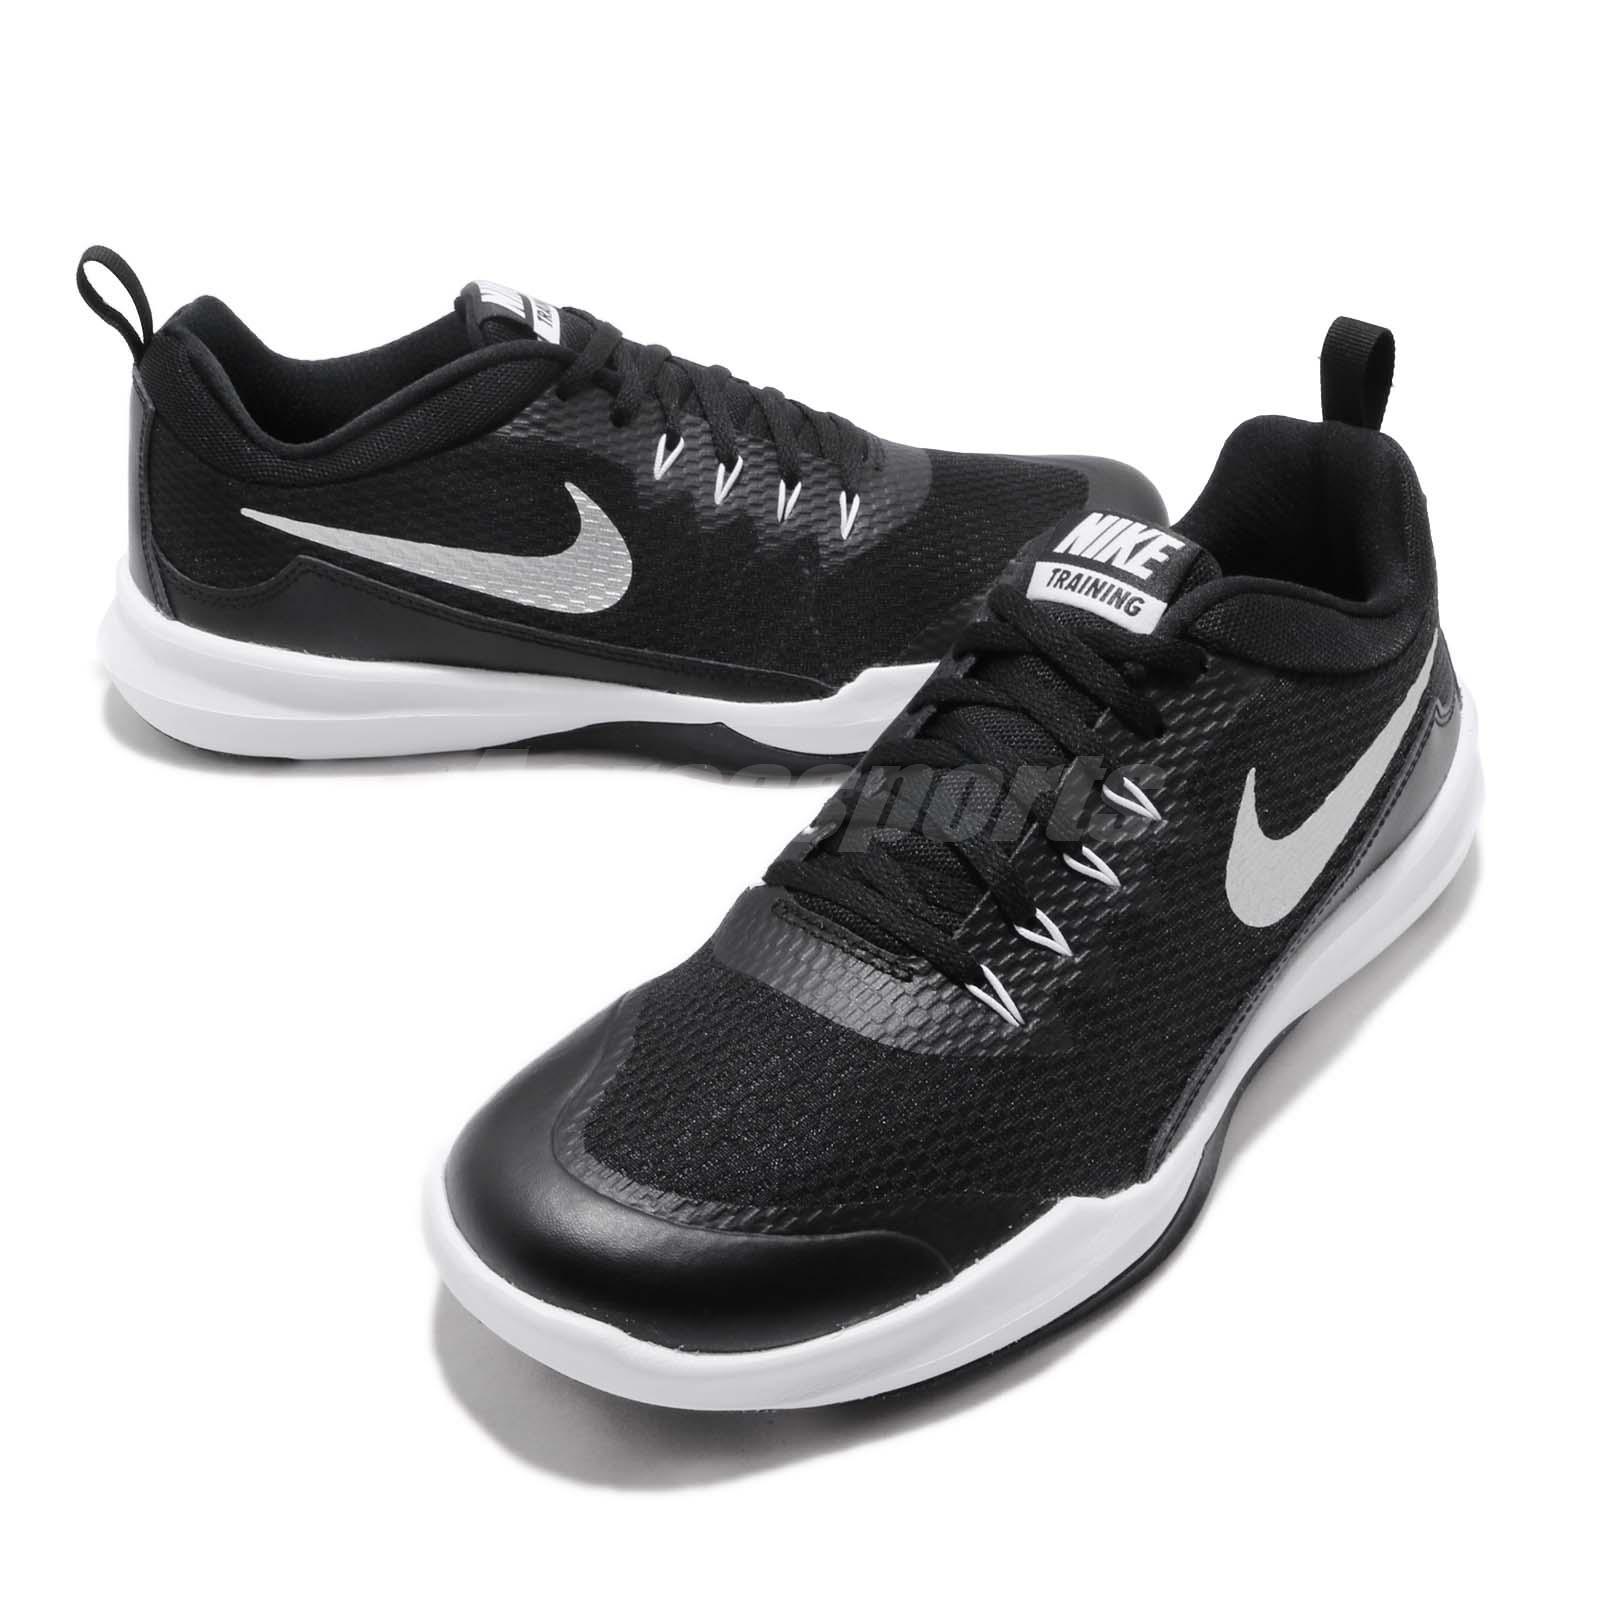 bfe5840048e Nike Legend Trainer Black Silver White Men Cross Training Shoes ...